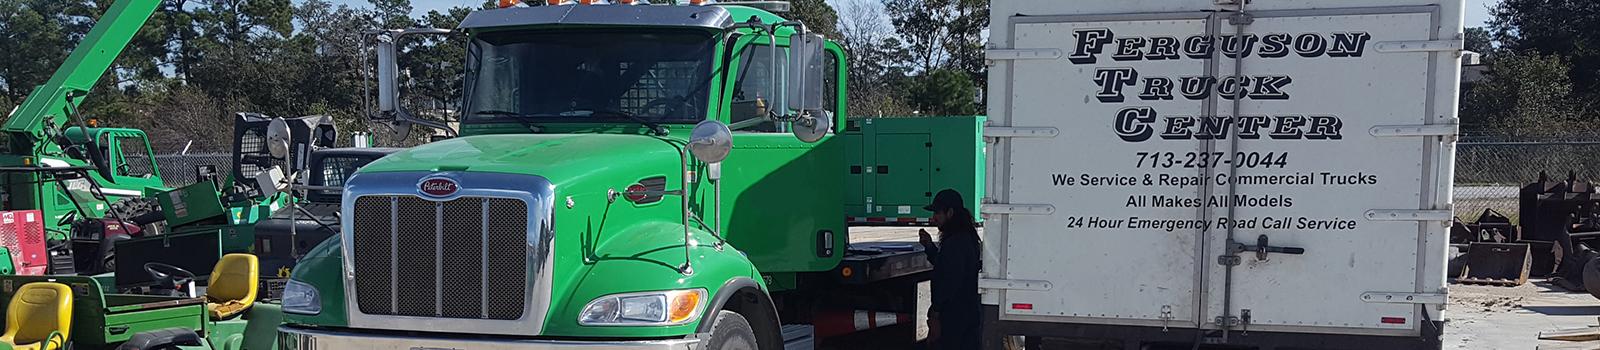 Houston Mobile Truck Repair Service